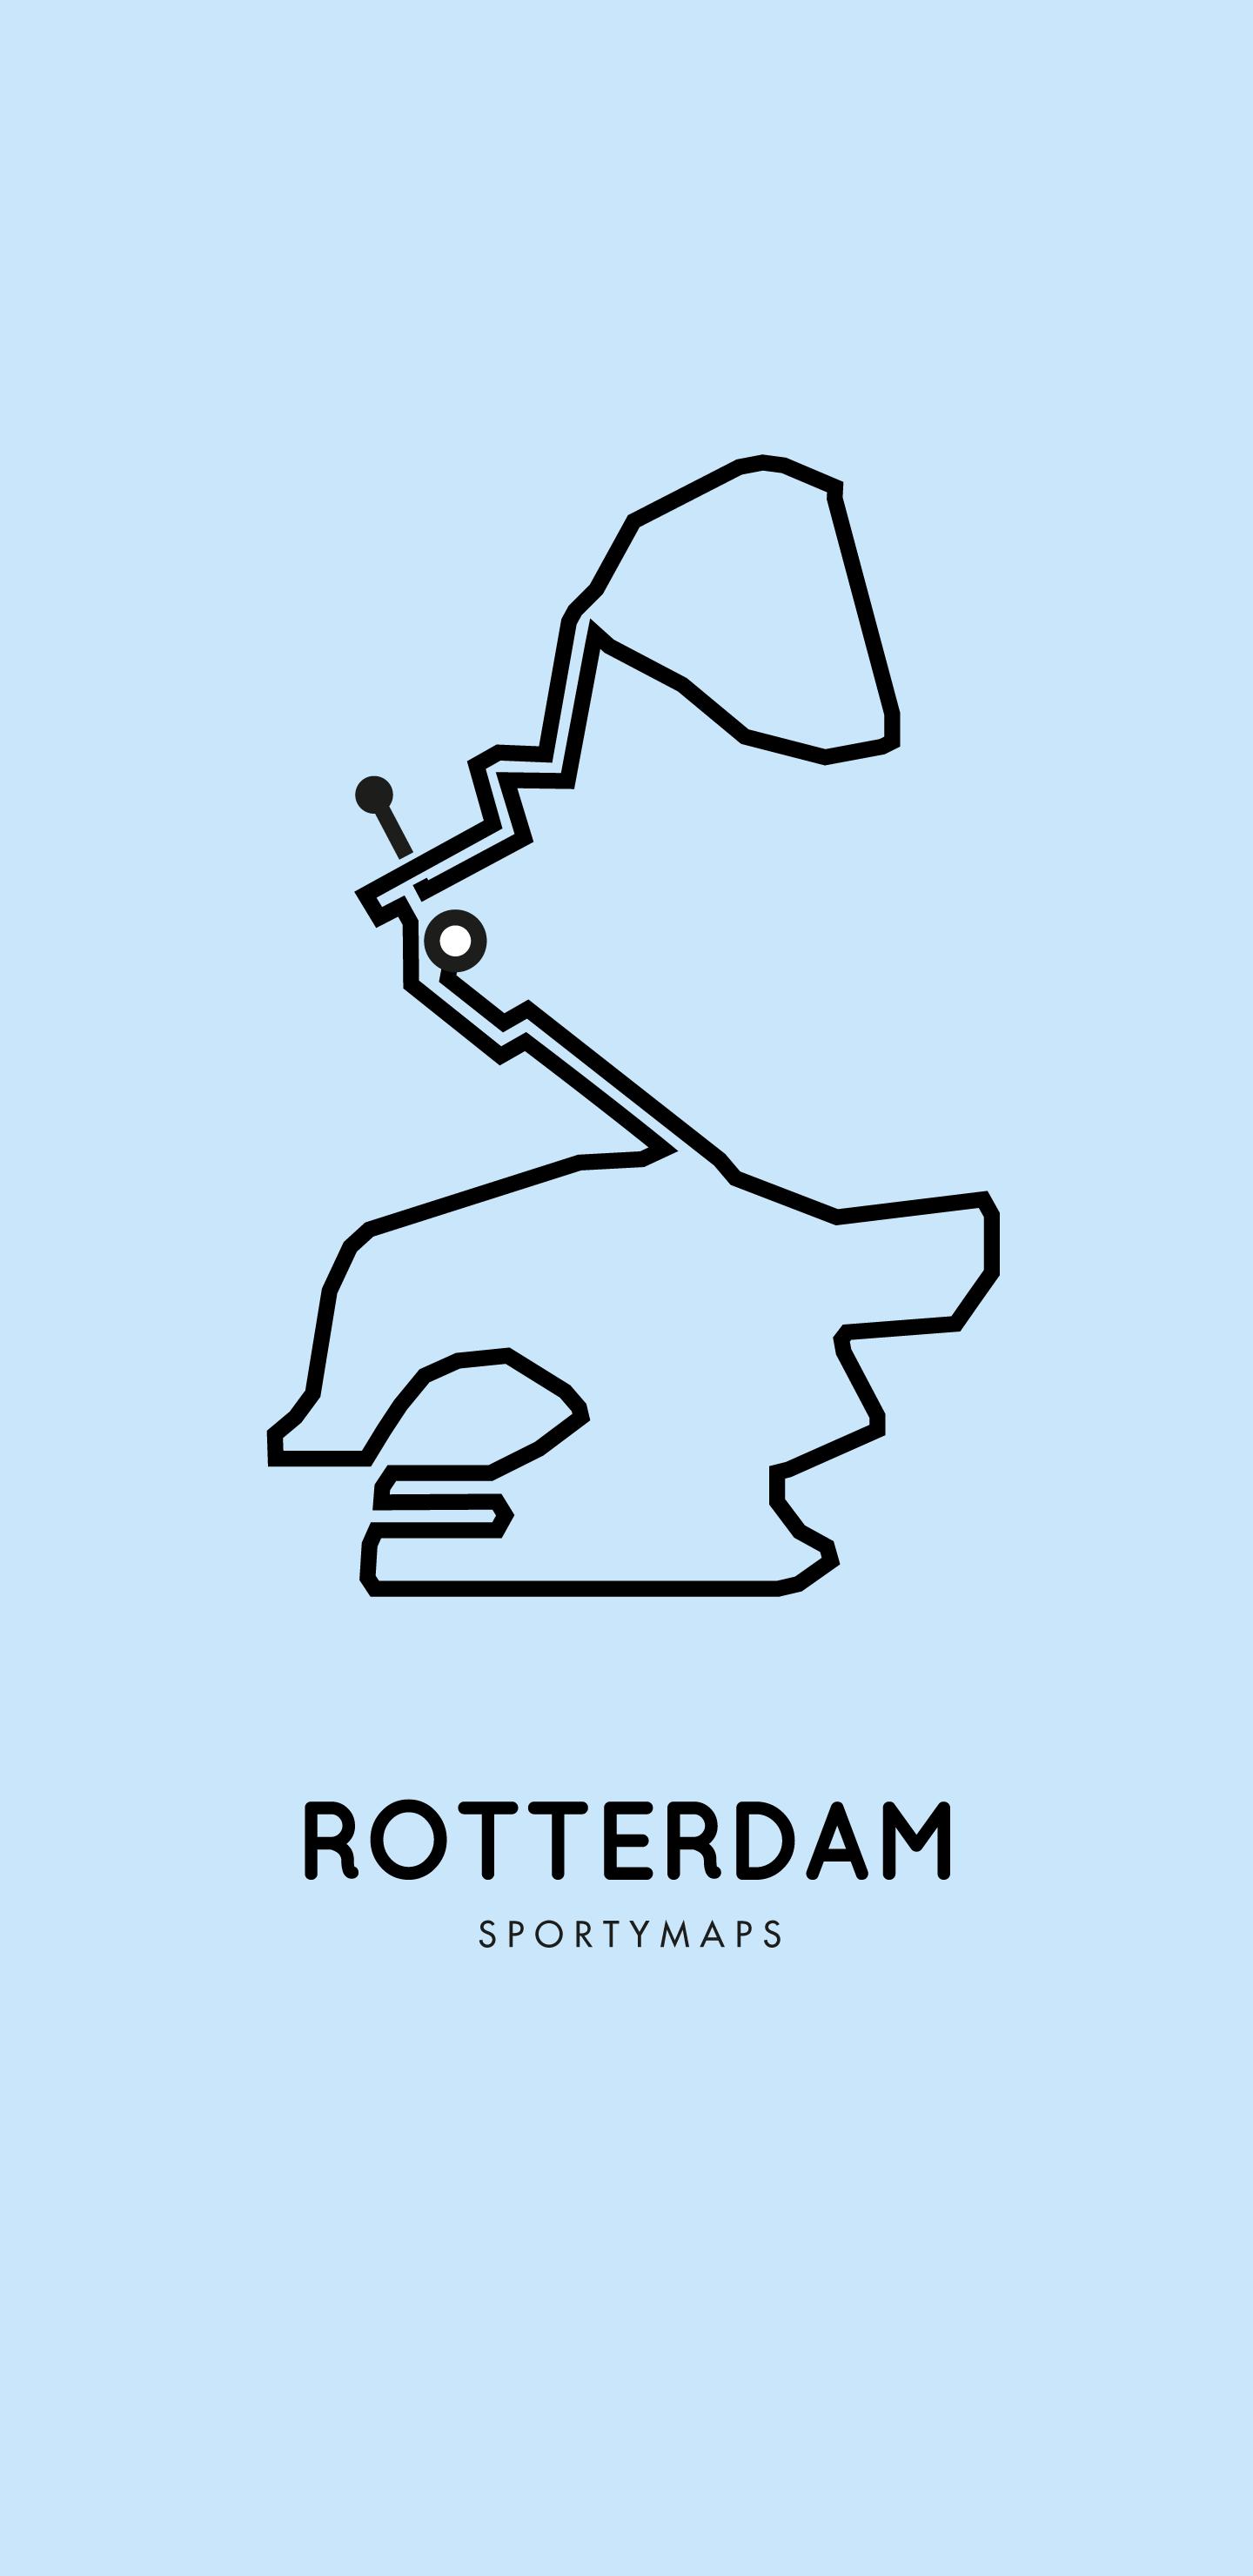 Sportymaps-Rotterdam-marathon-blue